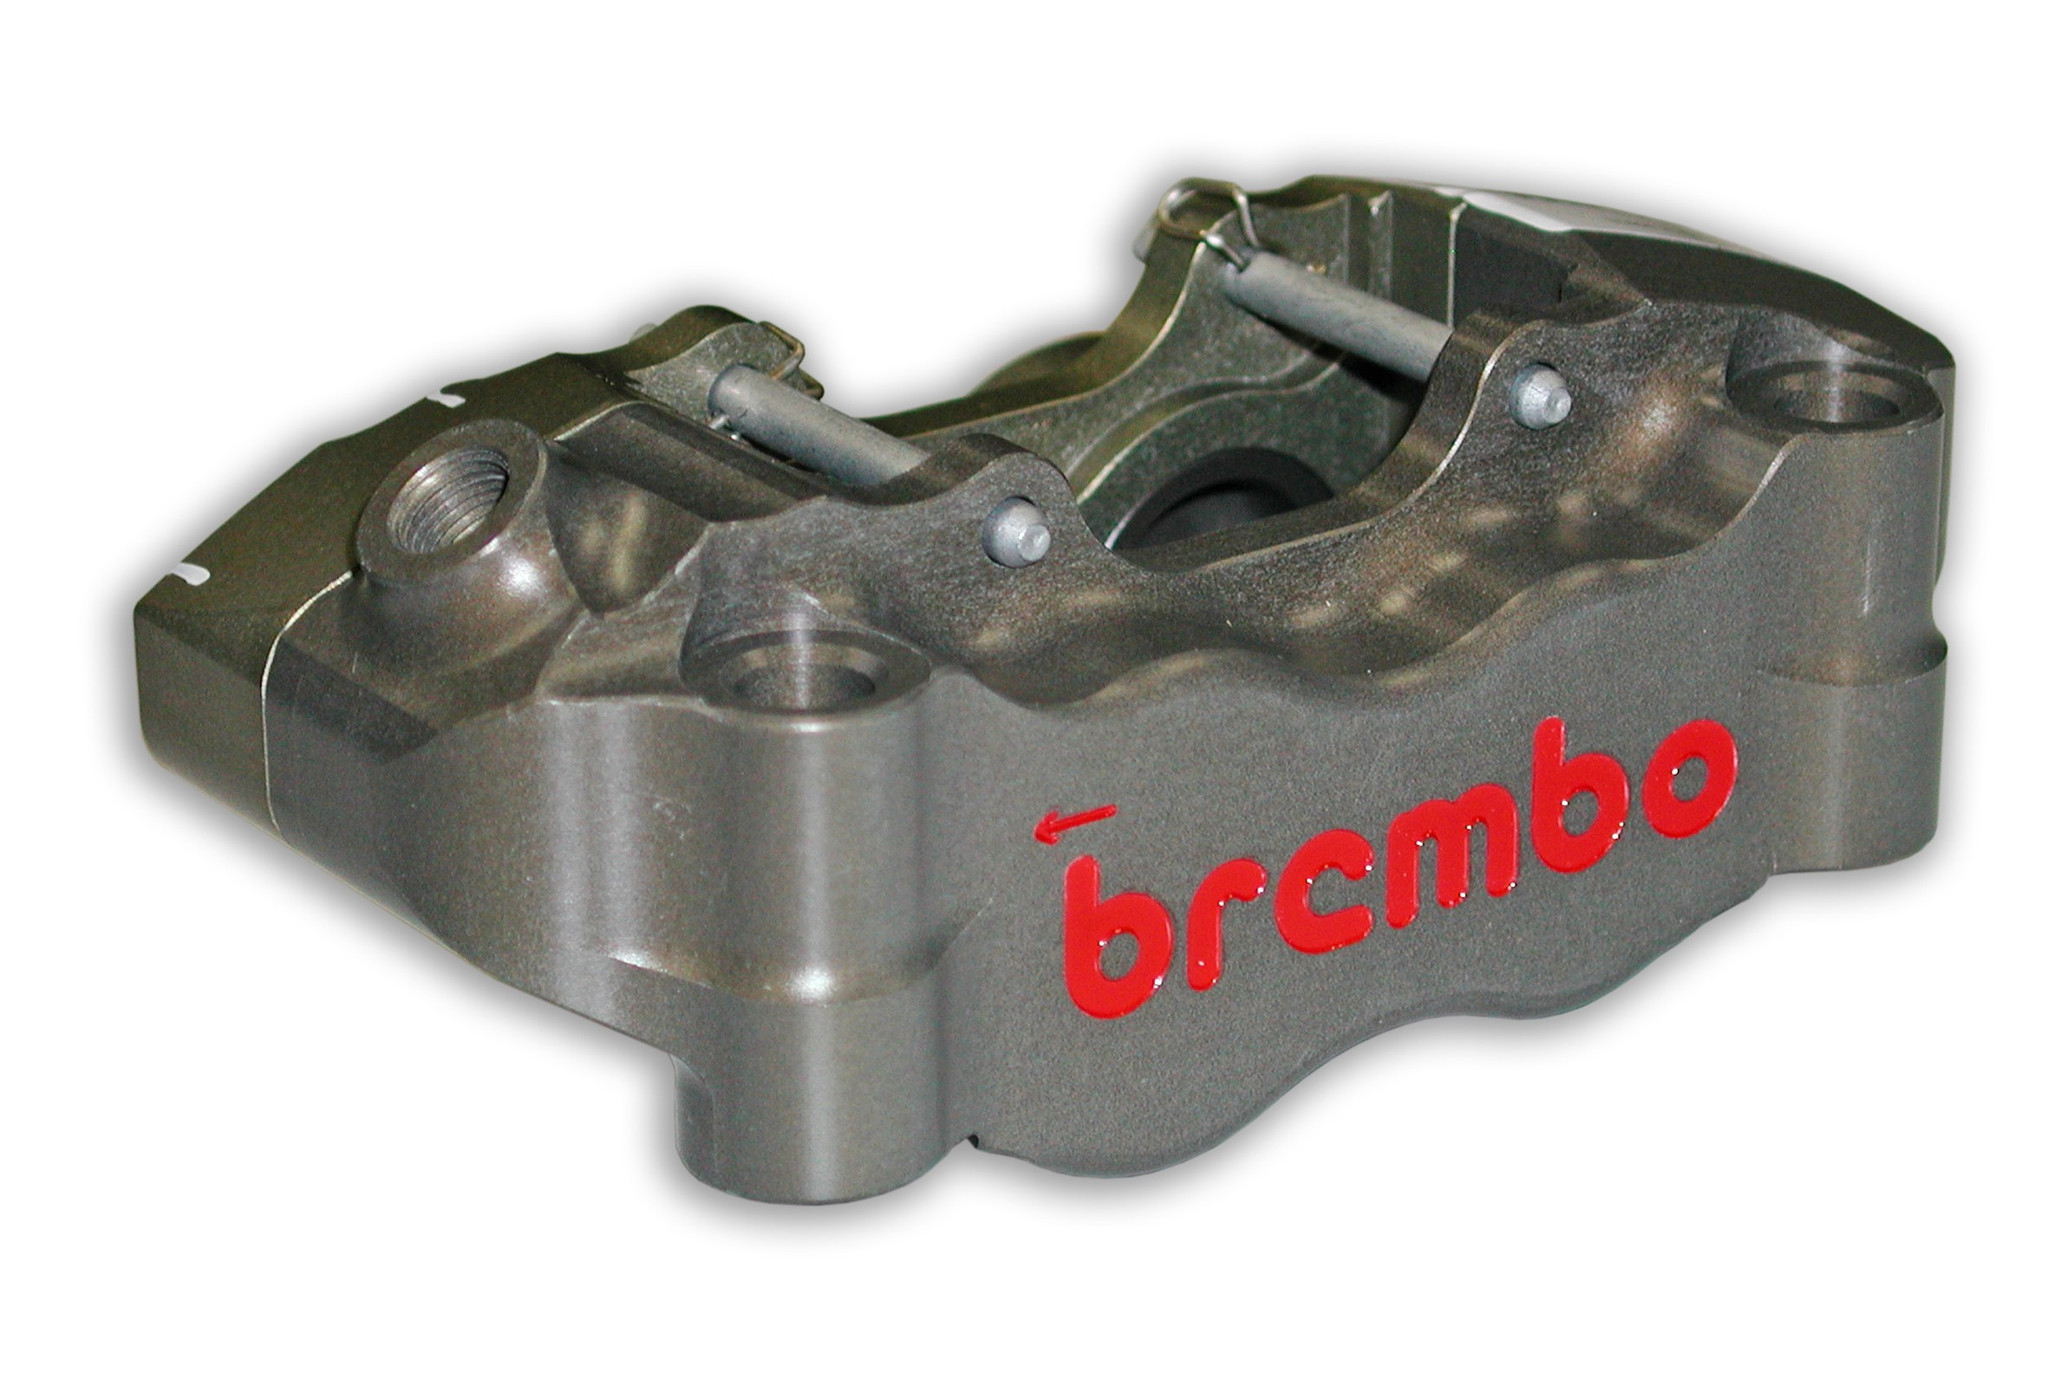 Brembo 100mm Supermoto Race Calipers